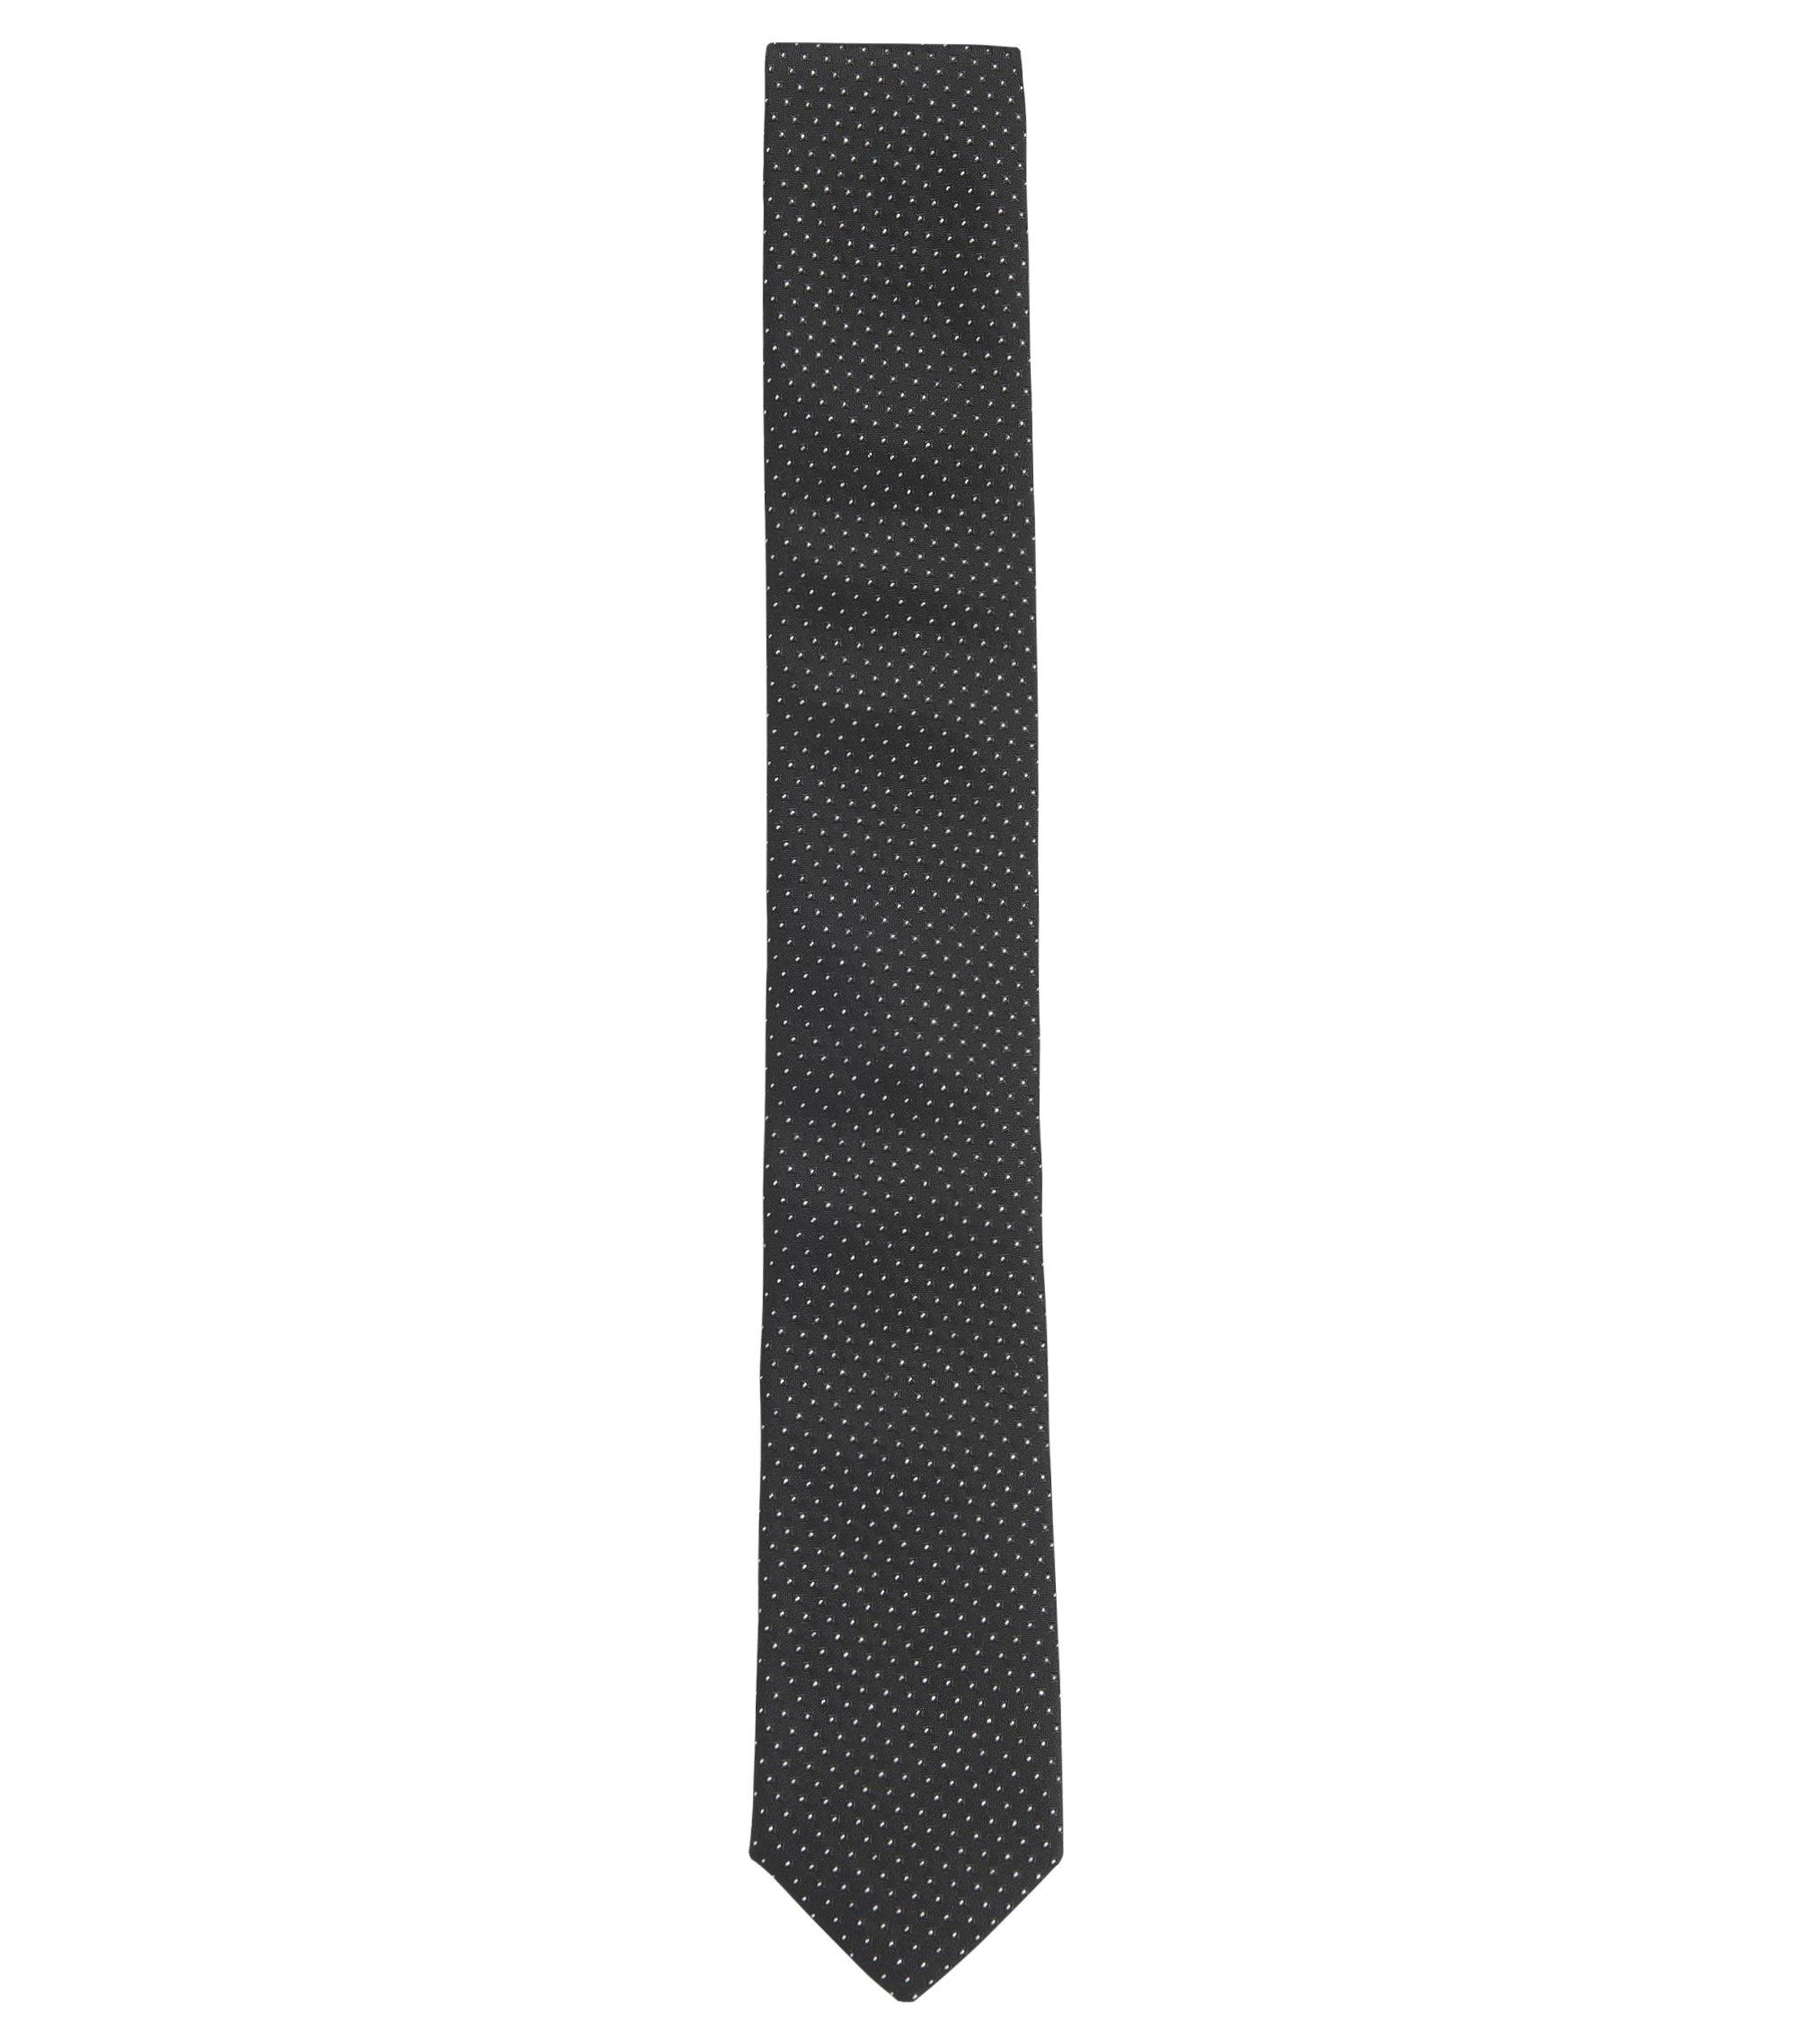 Metallic Dotted Italian Silk Slim Tie, Black